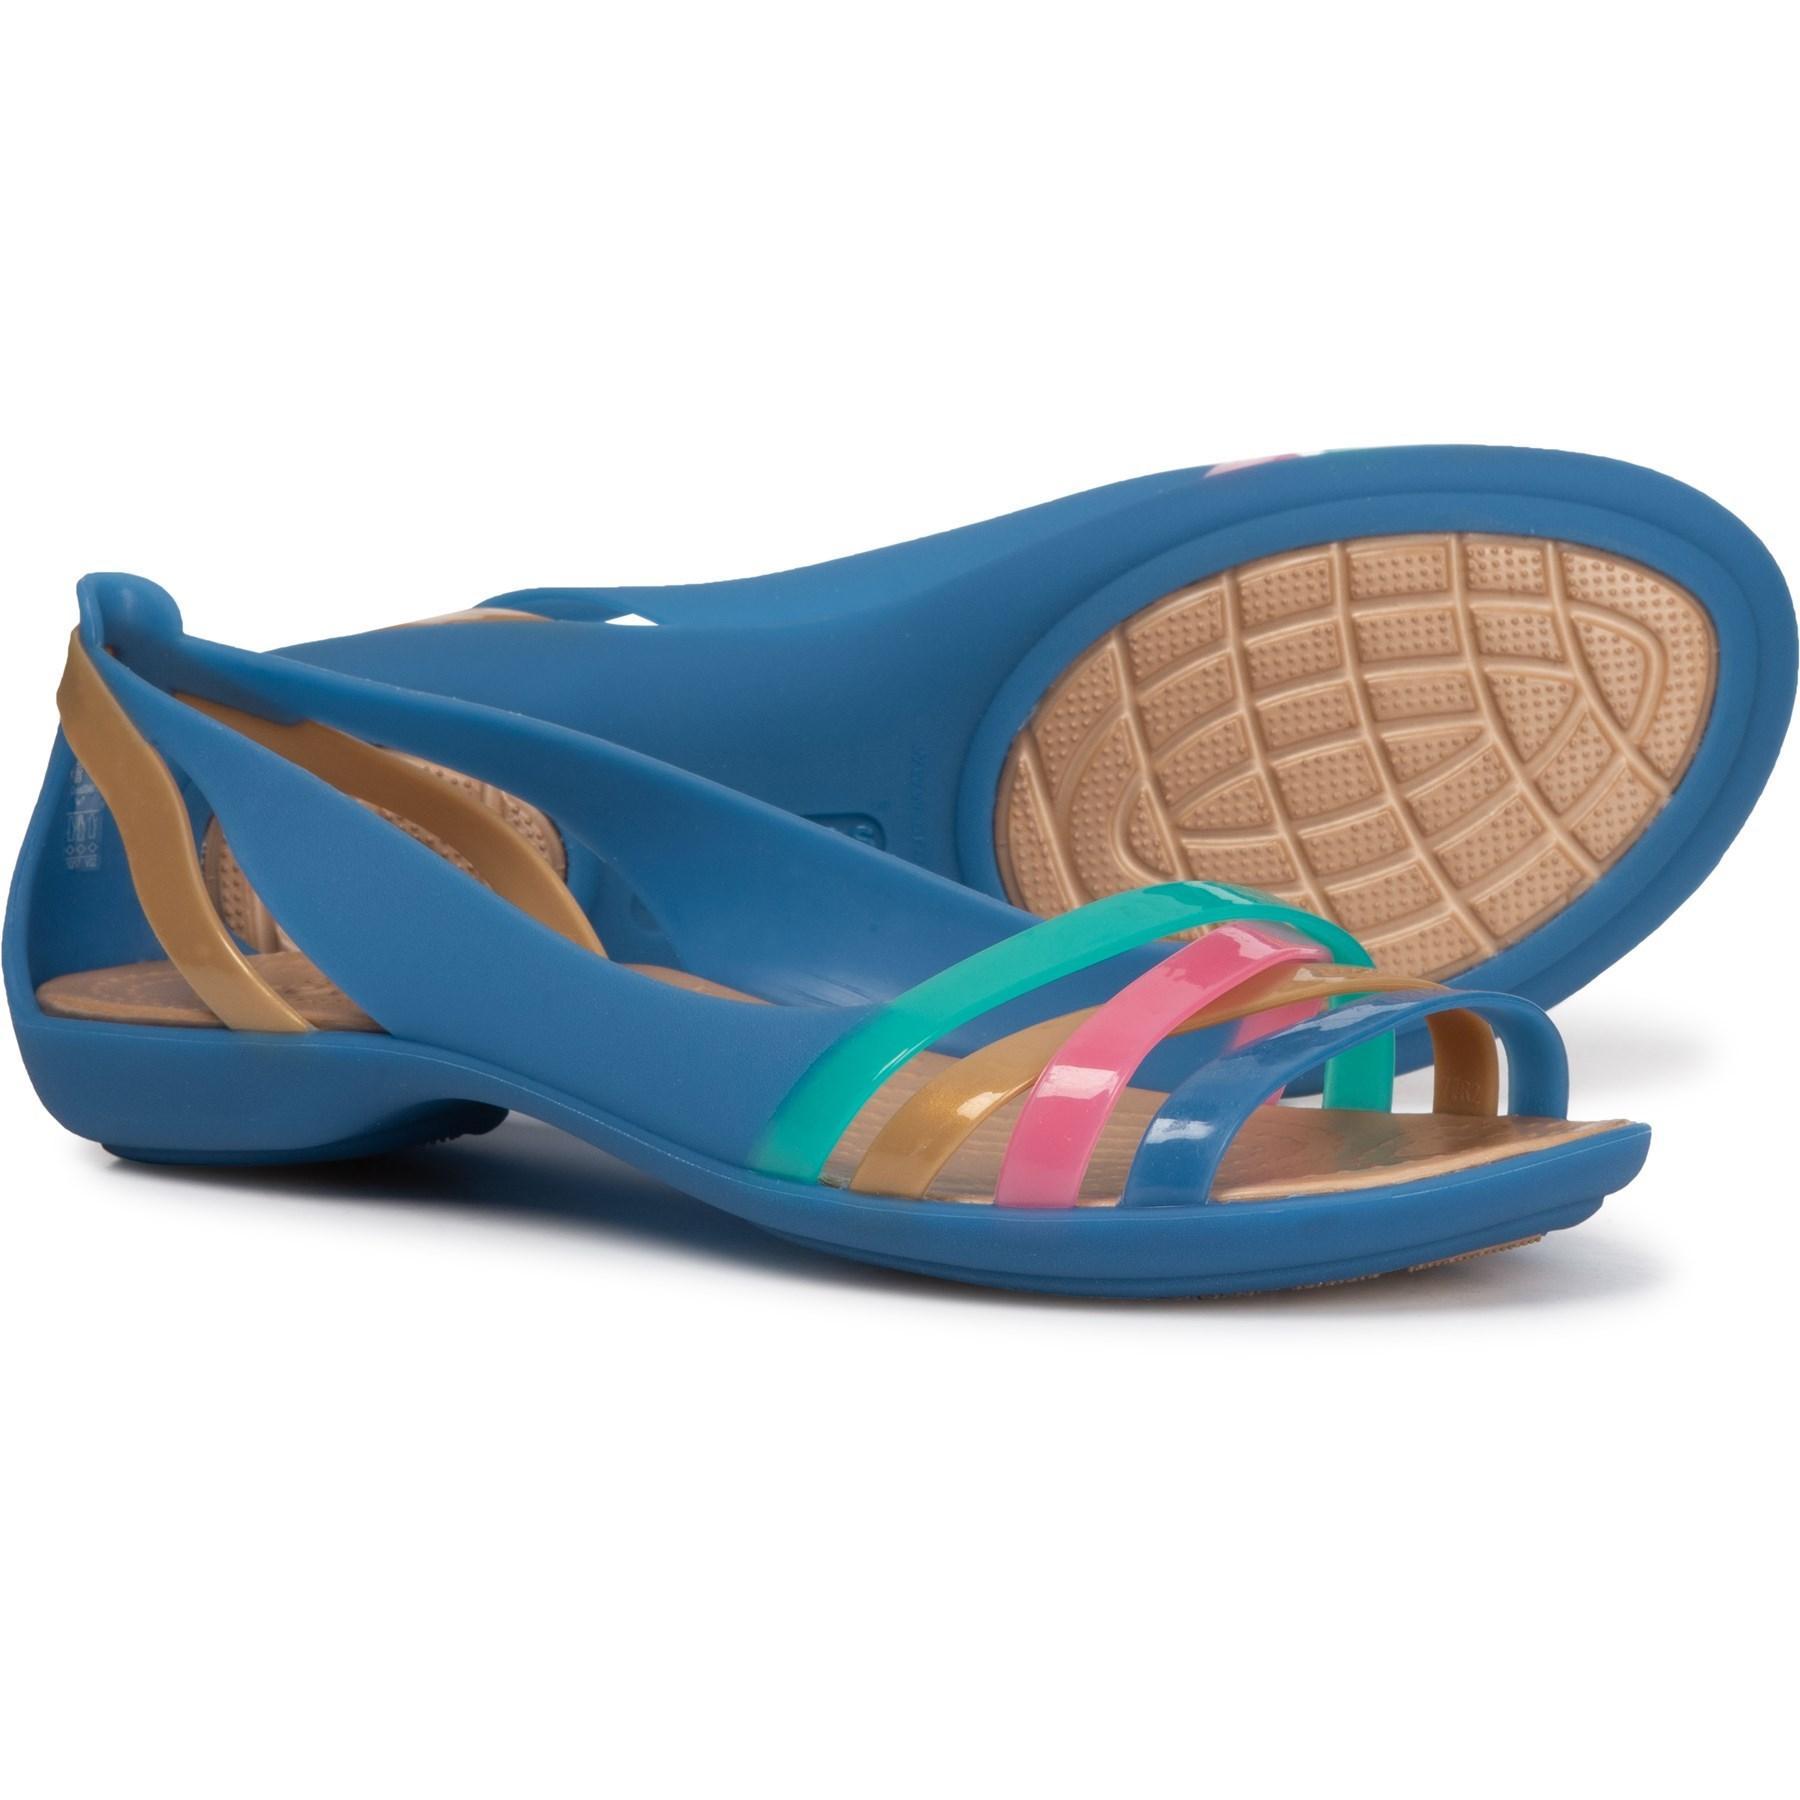 finest selection 08a59 25560 Crocs™ Isabella Huarache 2 Flat (blue Jean/gold) Flat Shoes